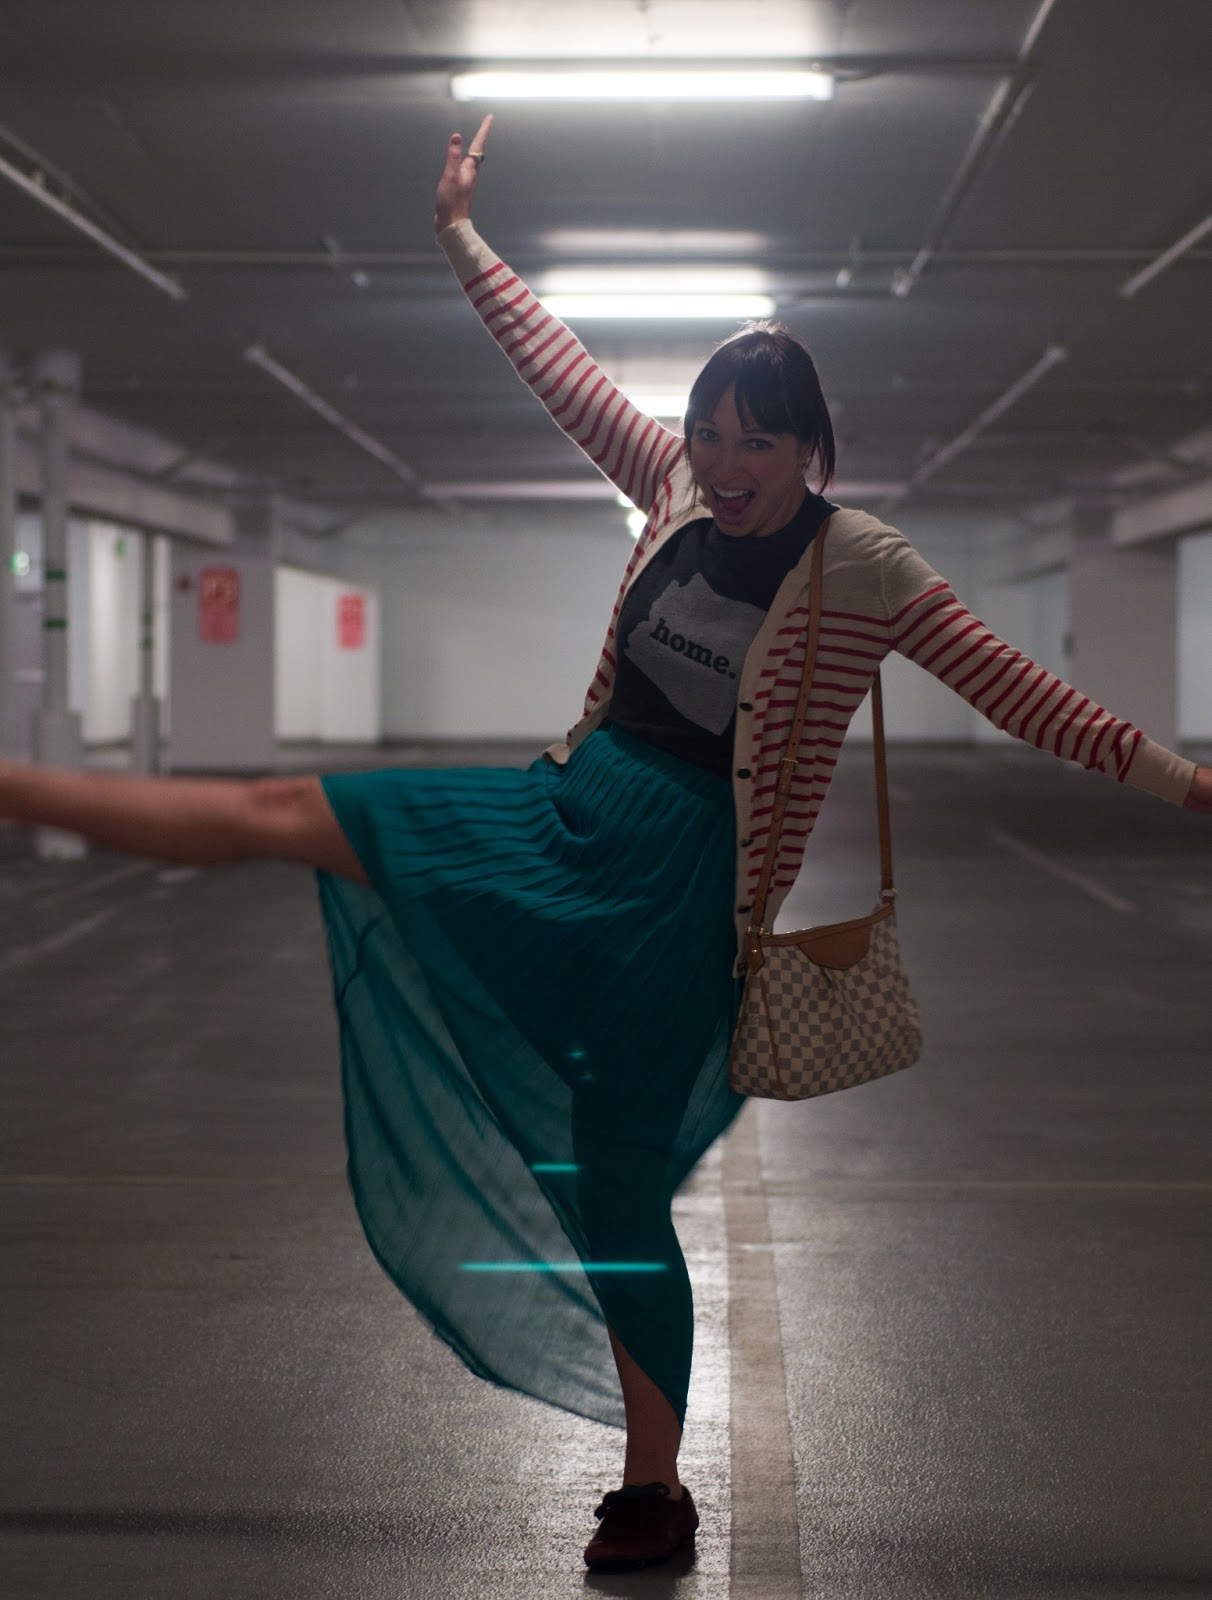 fashion blogger, ootd, mens fashion blog, womens fashion blog, home t, arizona, bdg. bdg, anchor, stripes, pleated skirt, teal skirt, american apparel, louis vuitton, louis vuitton crossbody, siracusa mm, damier, louis vuitton handbag, target, naya, nordstrom, target skirt, oxford, anthropologie ootd, mac, mac lipstick, mac sheen lipstick, parking garage, salt lake city, utah blogger, utah fashion blogger, mormon blogger, mormon clothing blogger, red and white stripes, goofy picture, city creek mall, city creek mall parking garage,